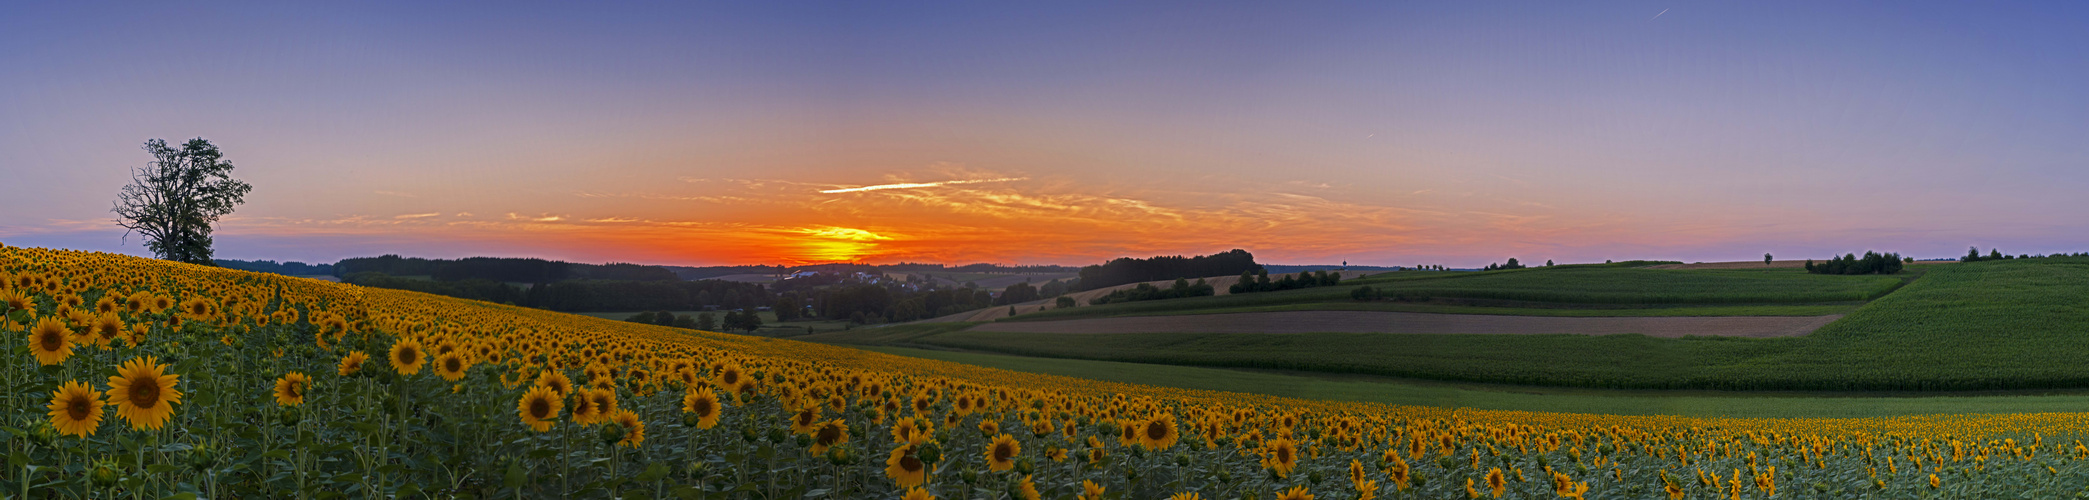 Panorama Sonnenblumenfeld im SU